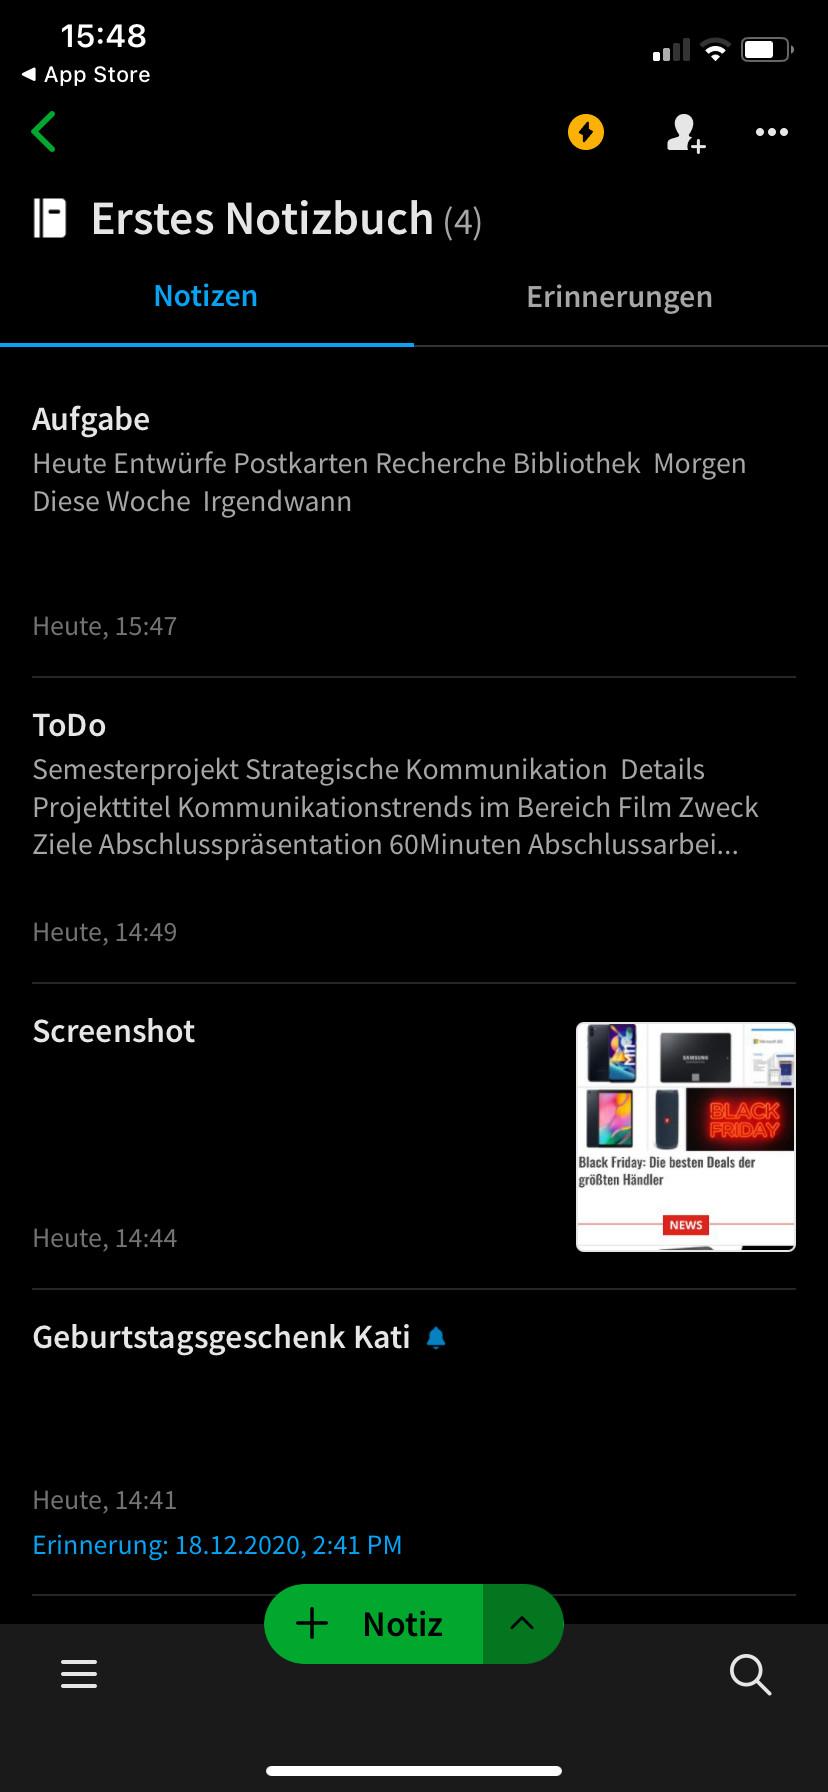 Screenshot 1 - Evernote (App für iPhone & iPad)